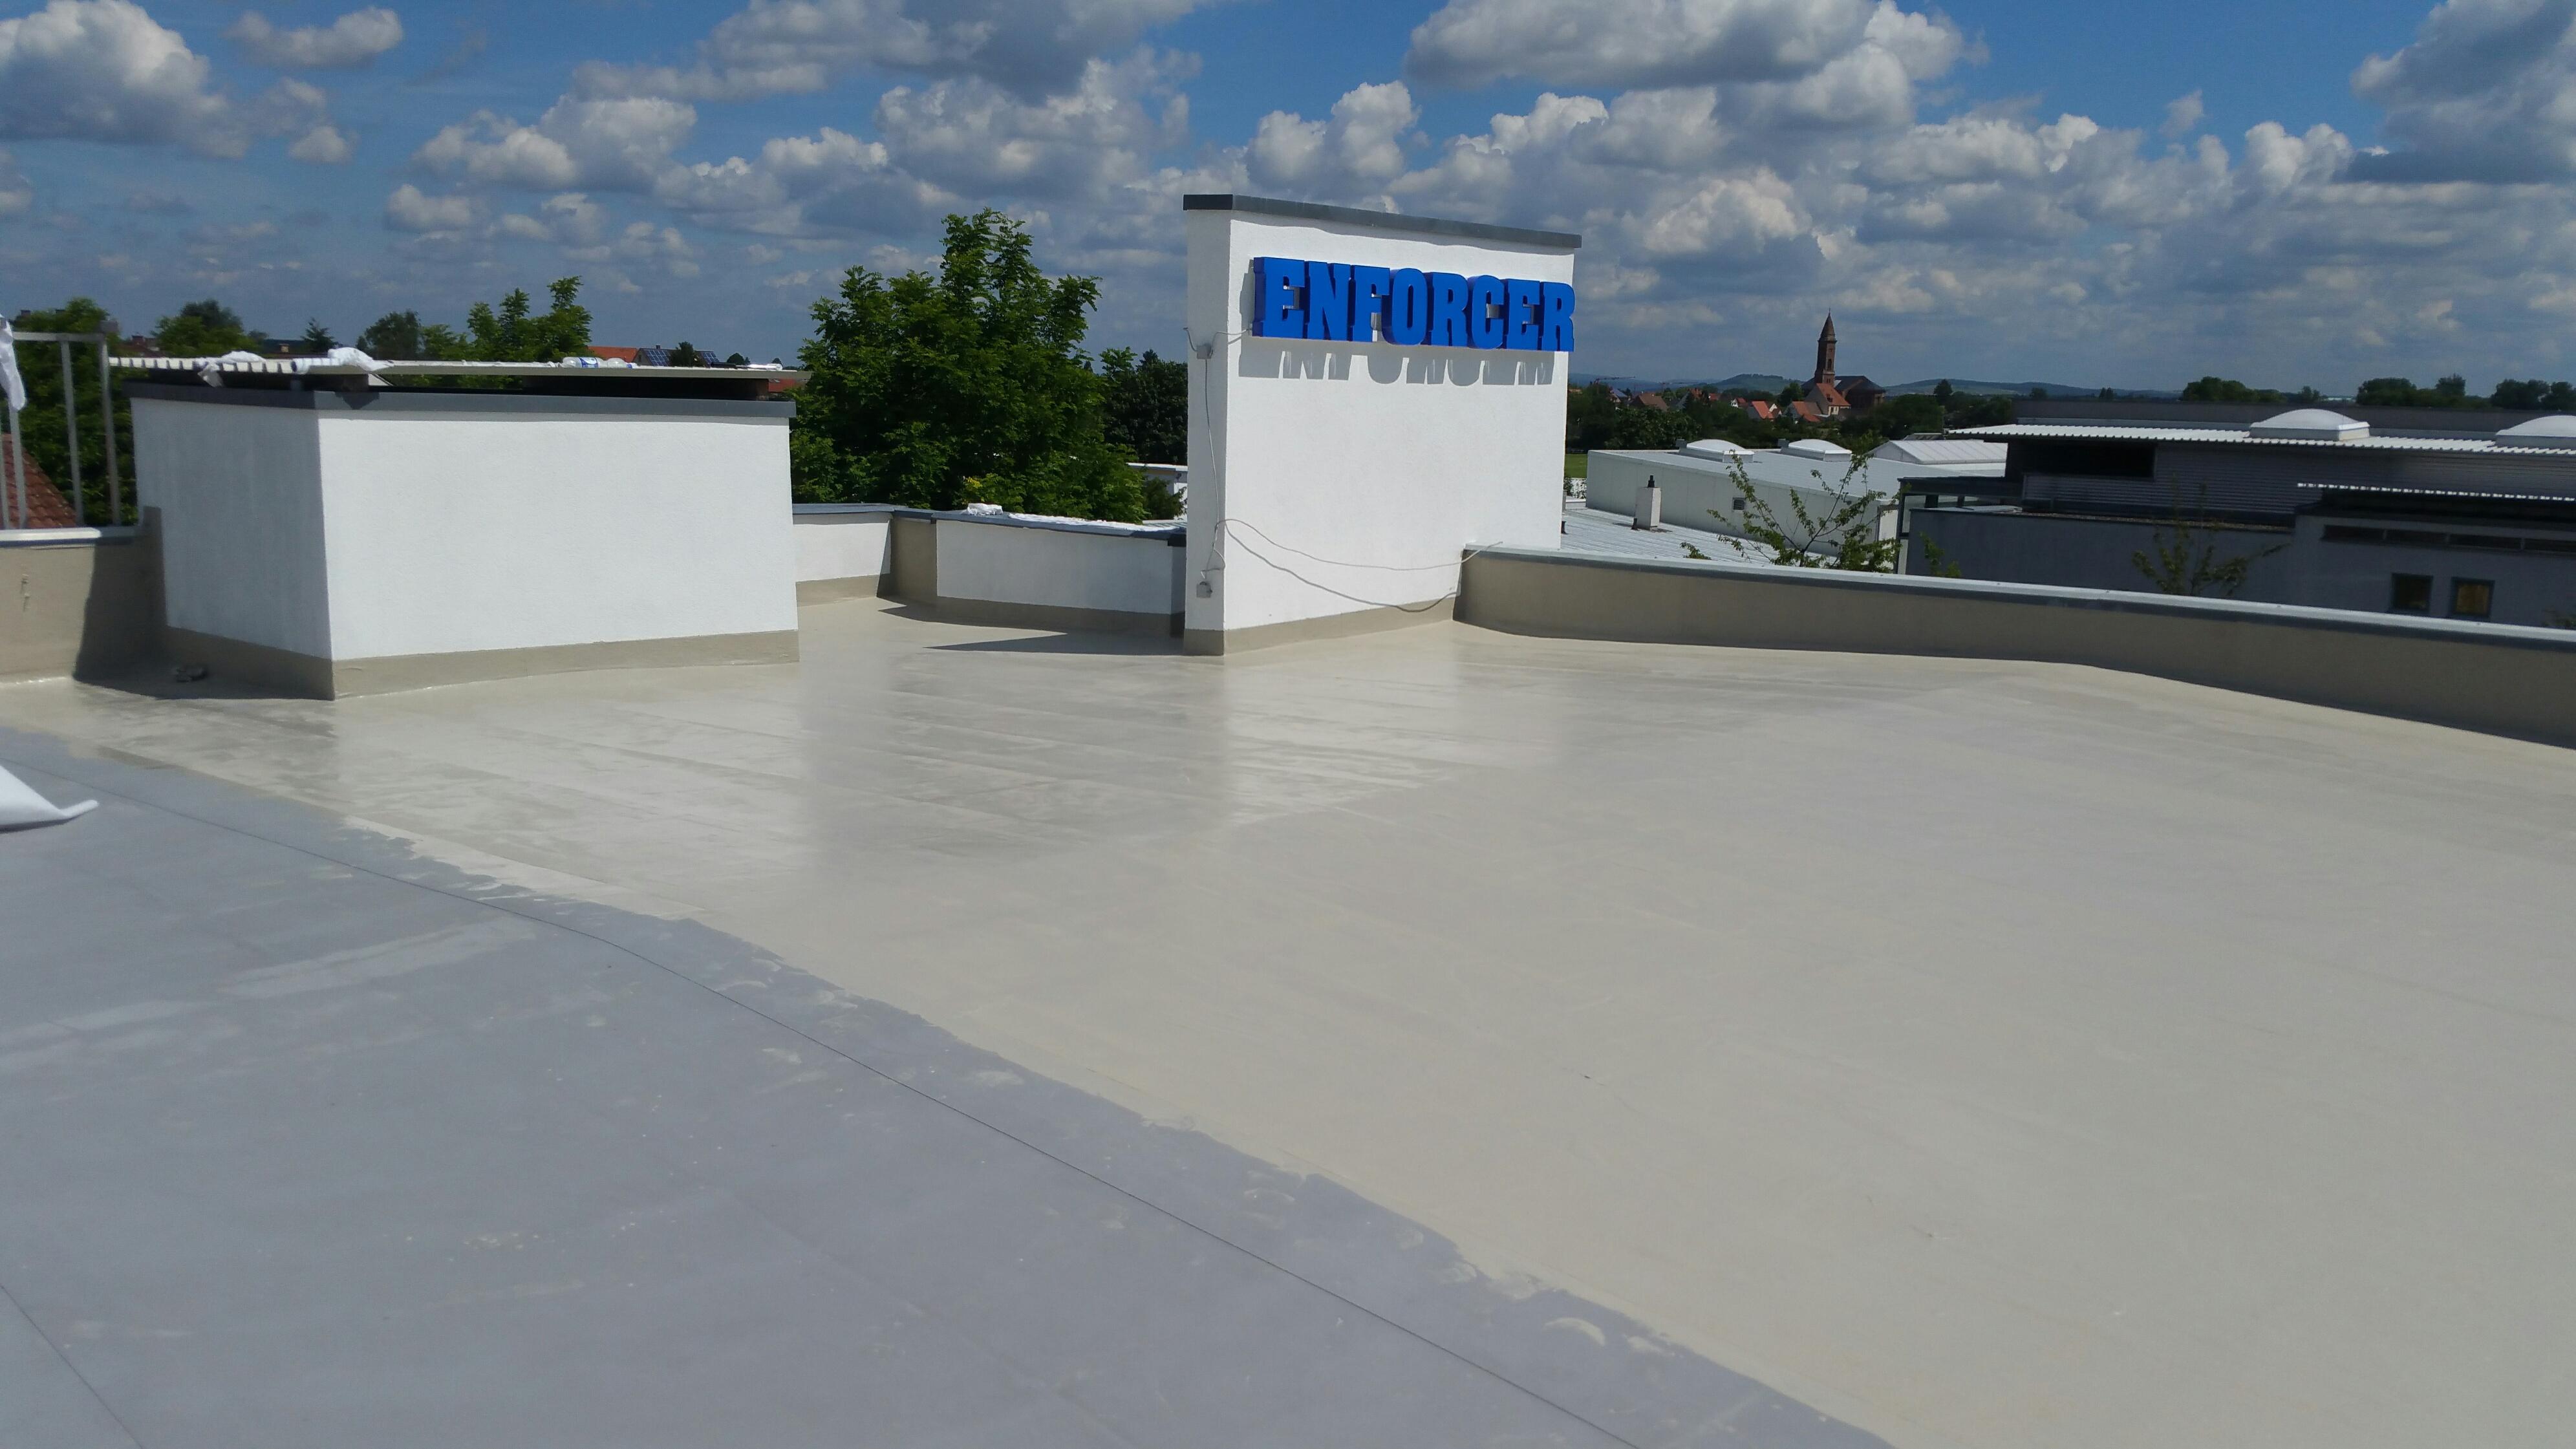 Firma Enforcer, Ubstadt-Weiher